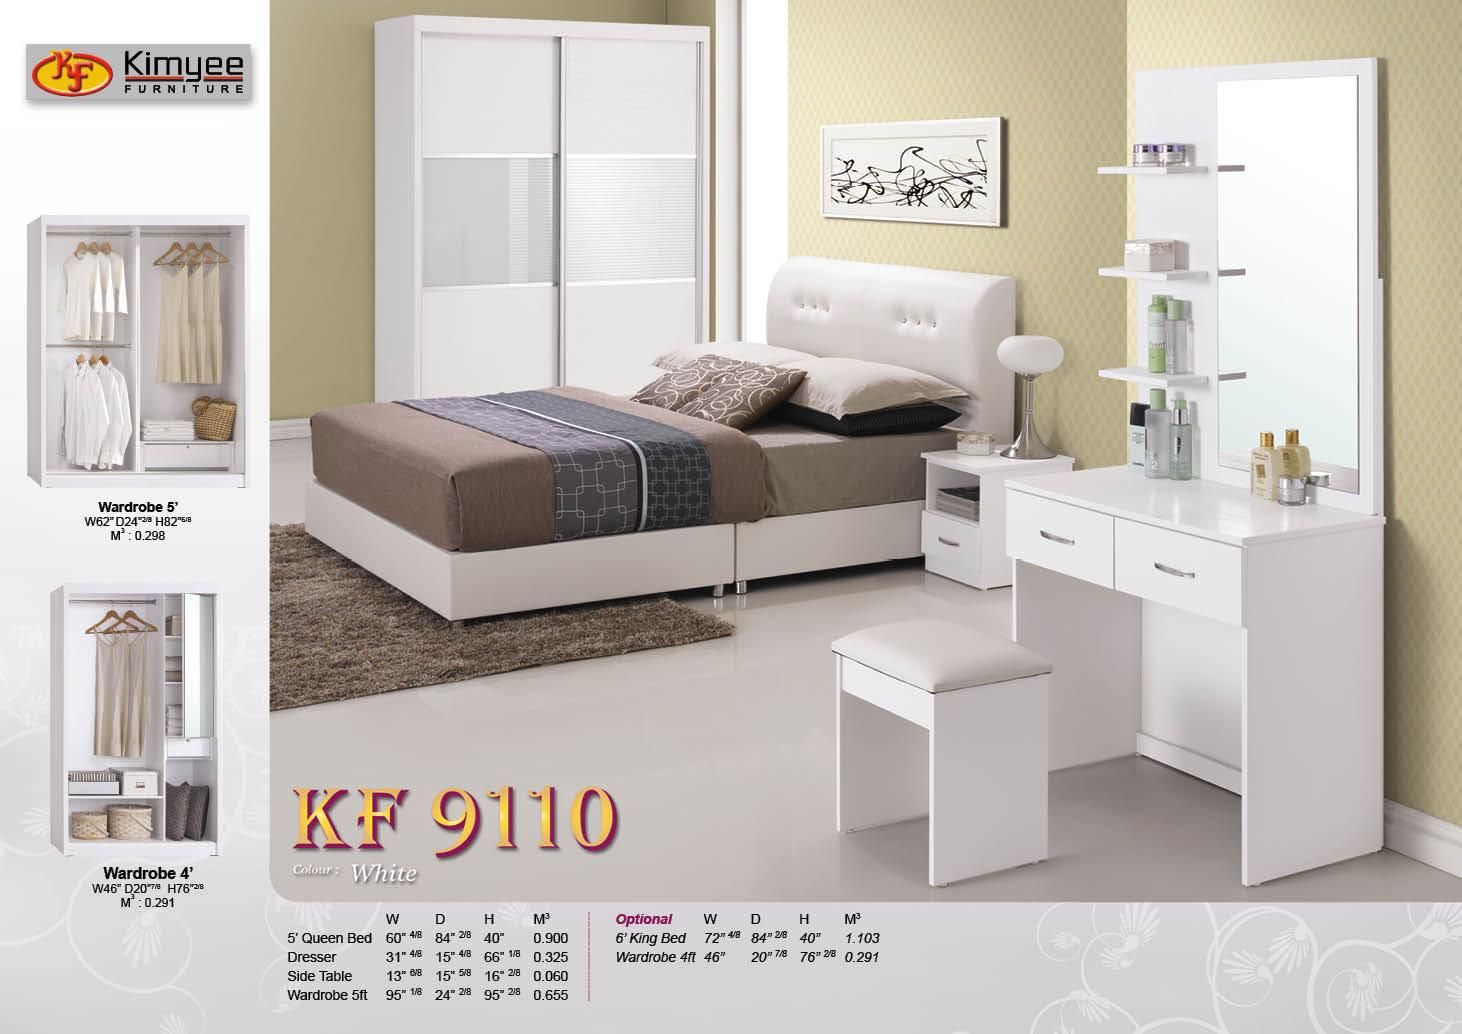 KF9110